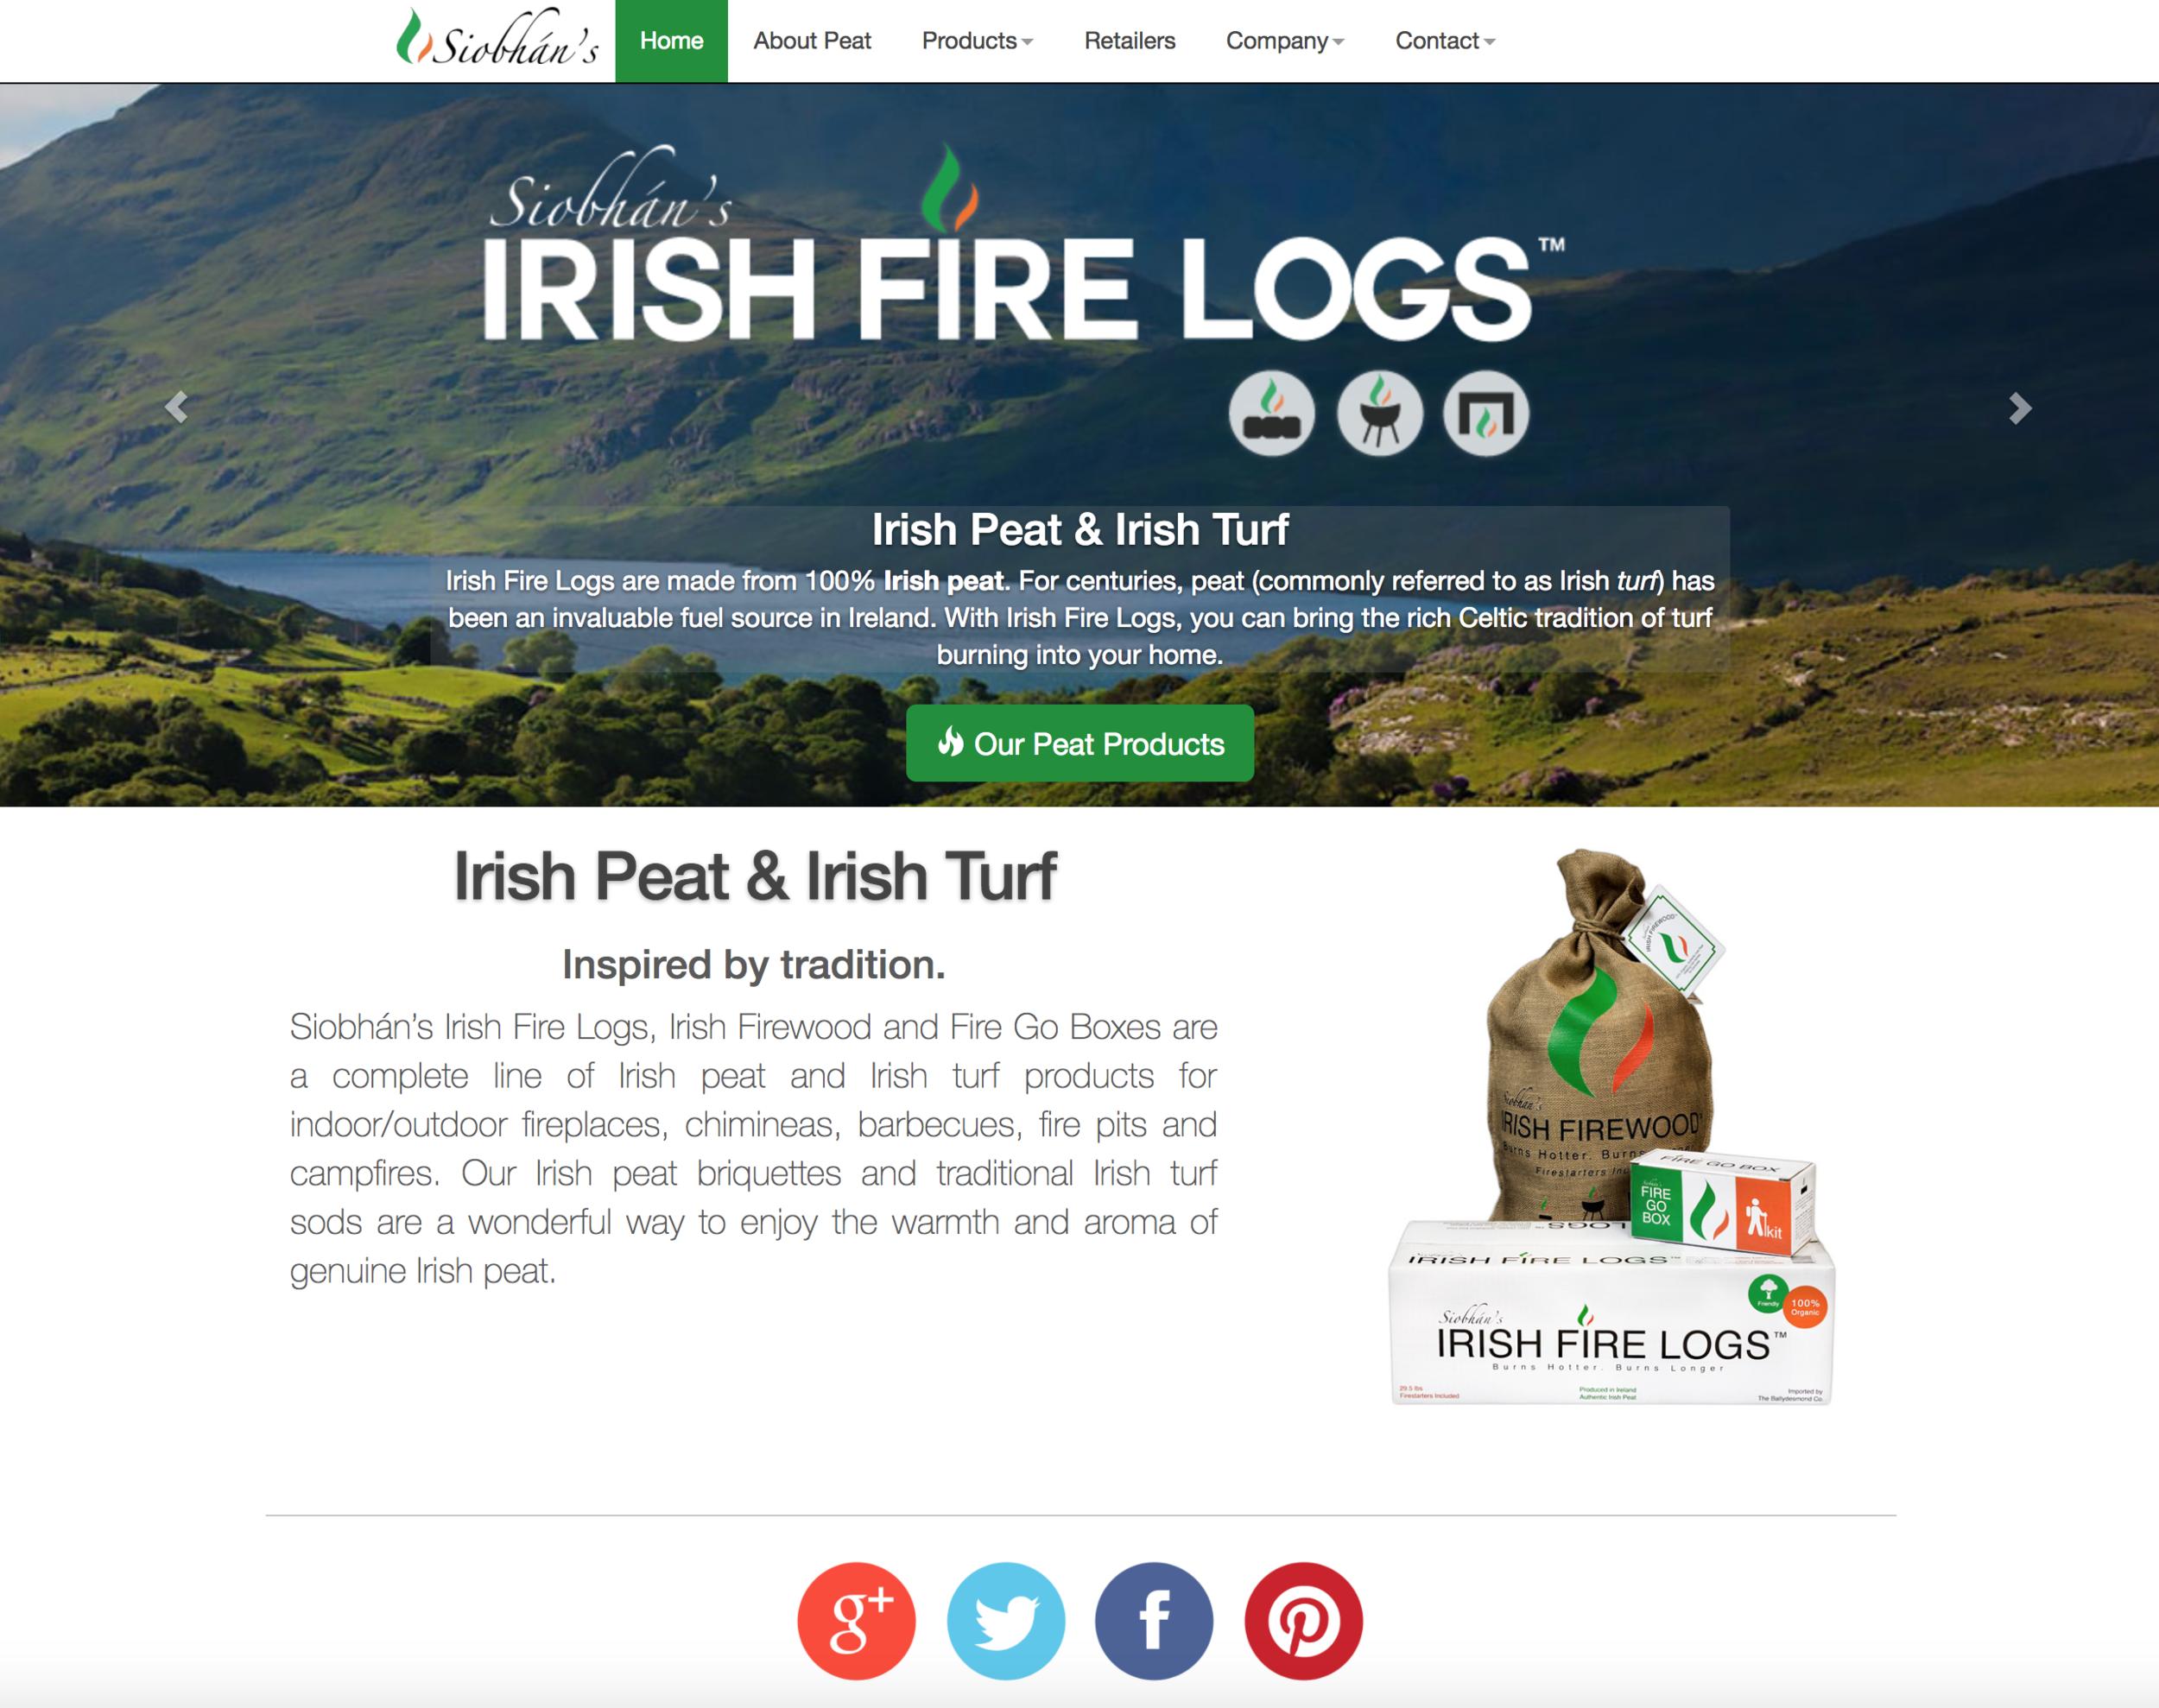 Irish Fire Logs